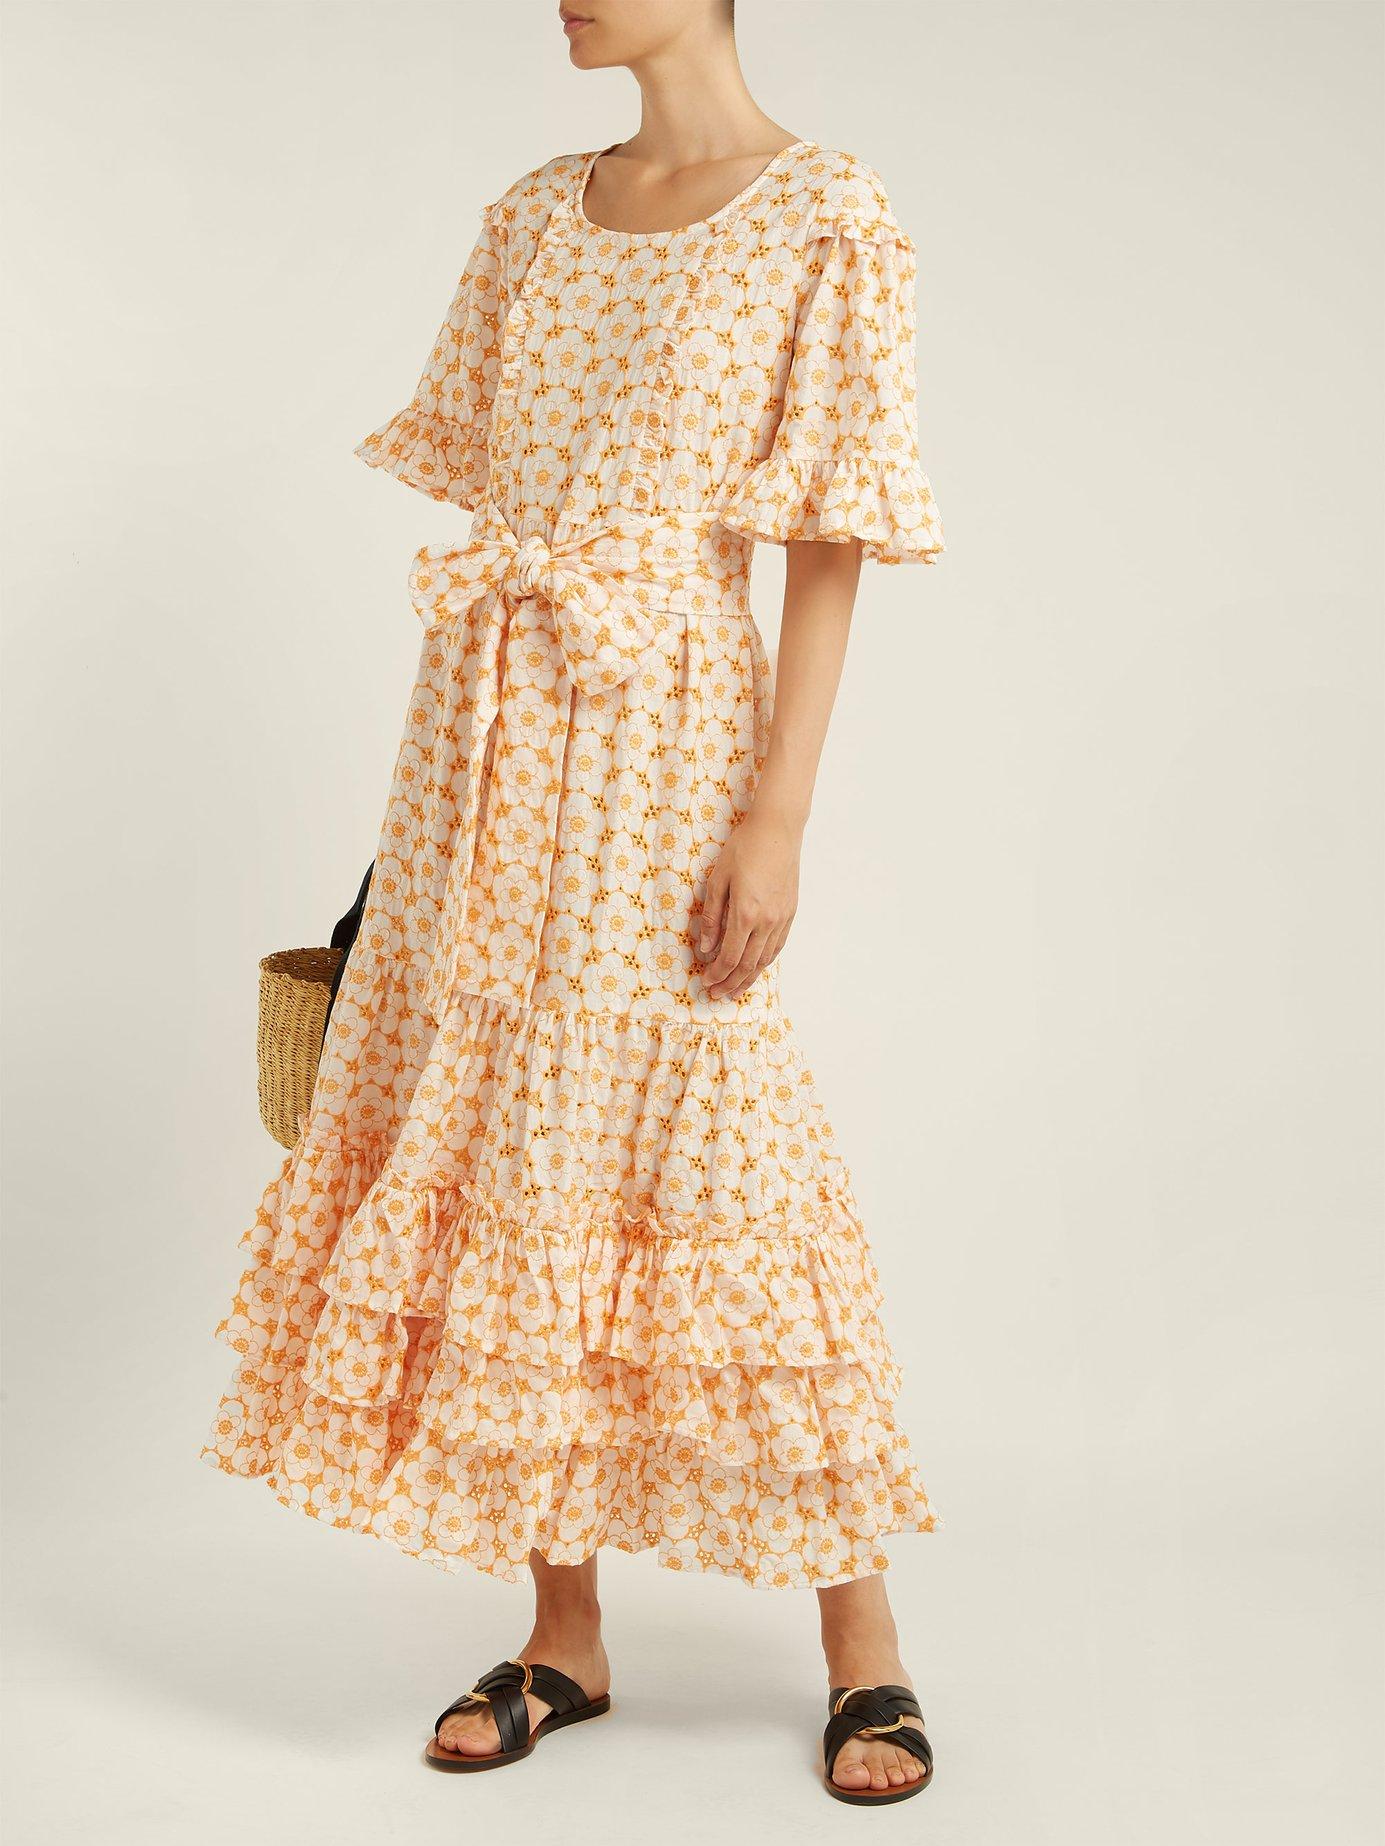 January cotton broderie anglaise midi dress by Lisa Marie Fernandez